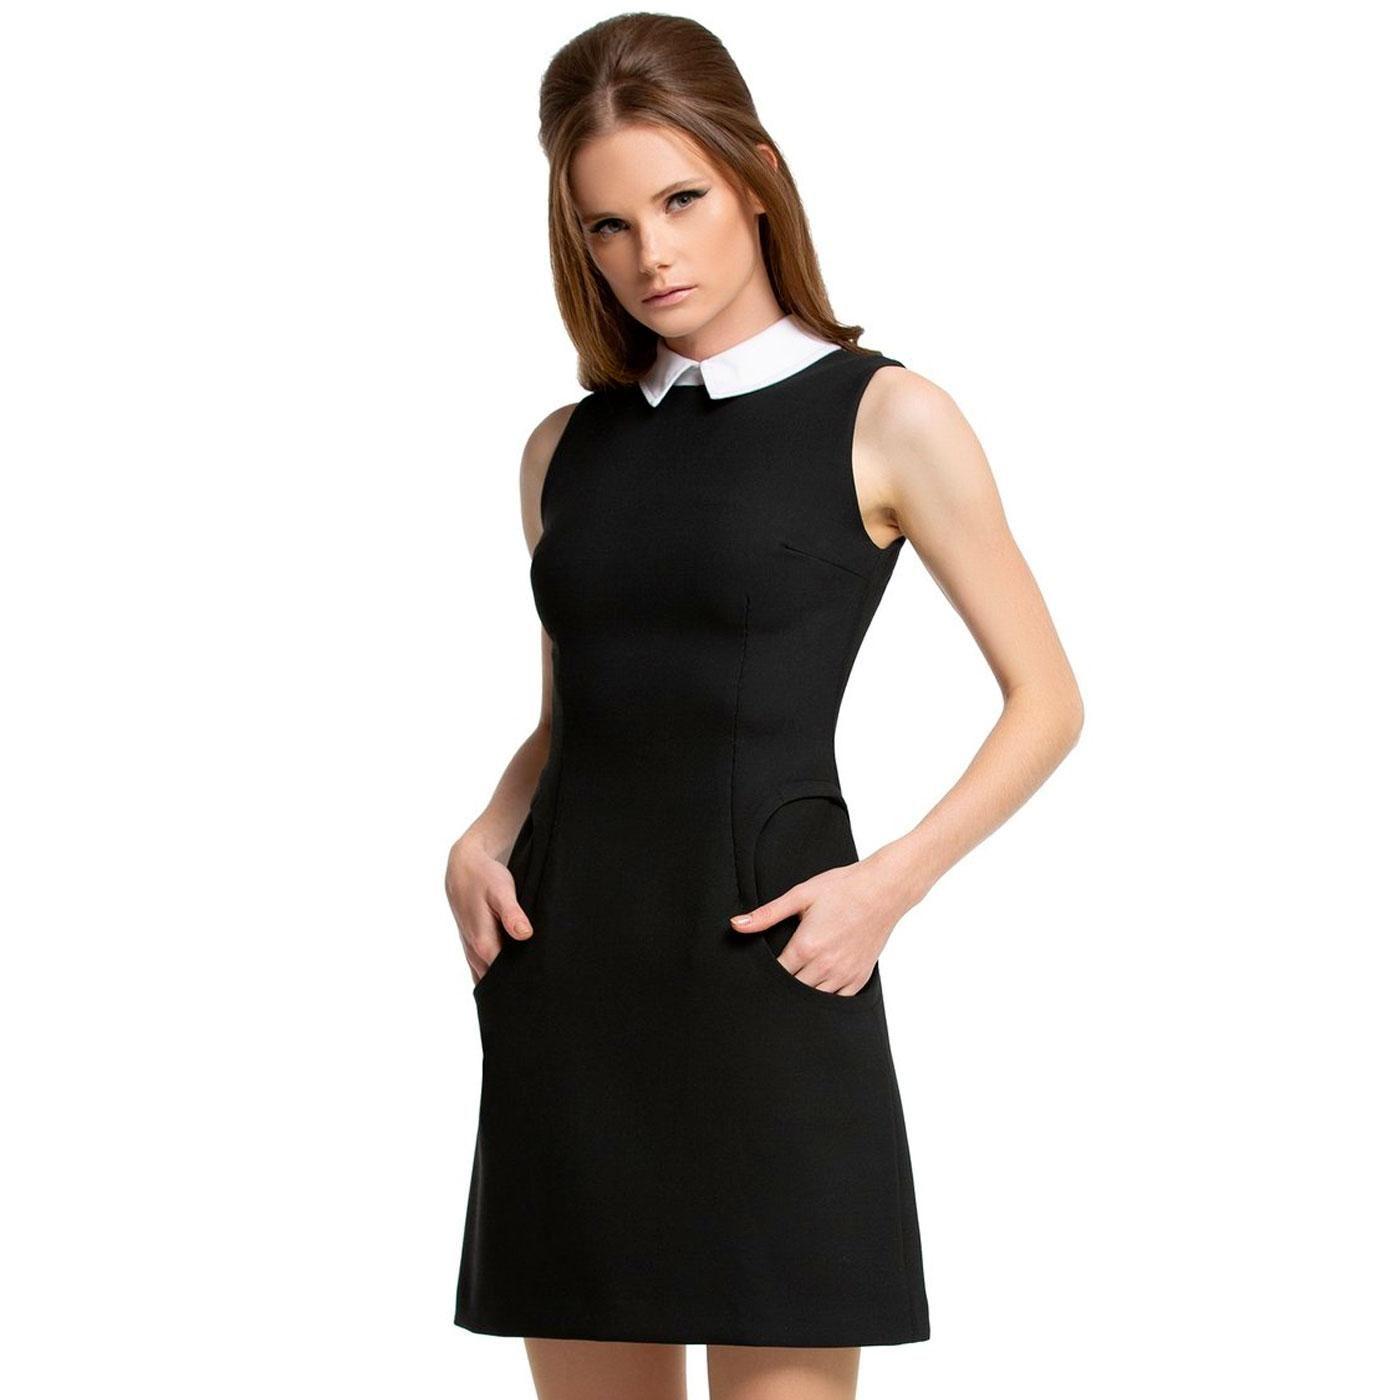 Marmalade 60s Mod Collared Circle Pocket Mini Dress Black Mini Black Dress Black Mod Dress Mod Dress 60s [ 1400 x 1400 Pixel ]